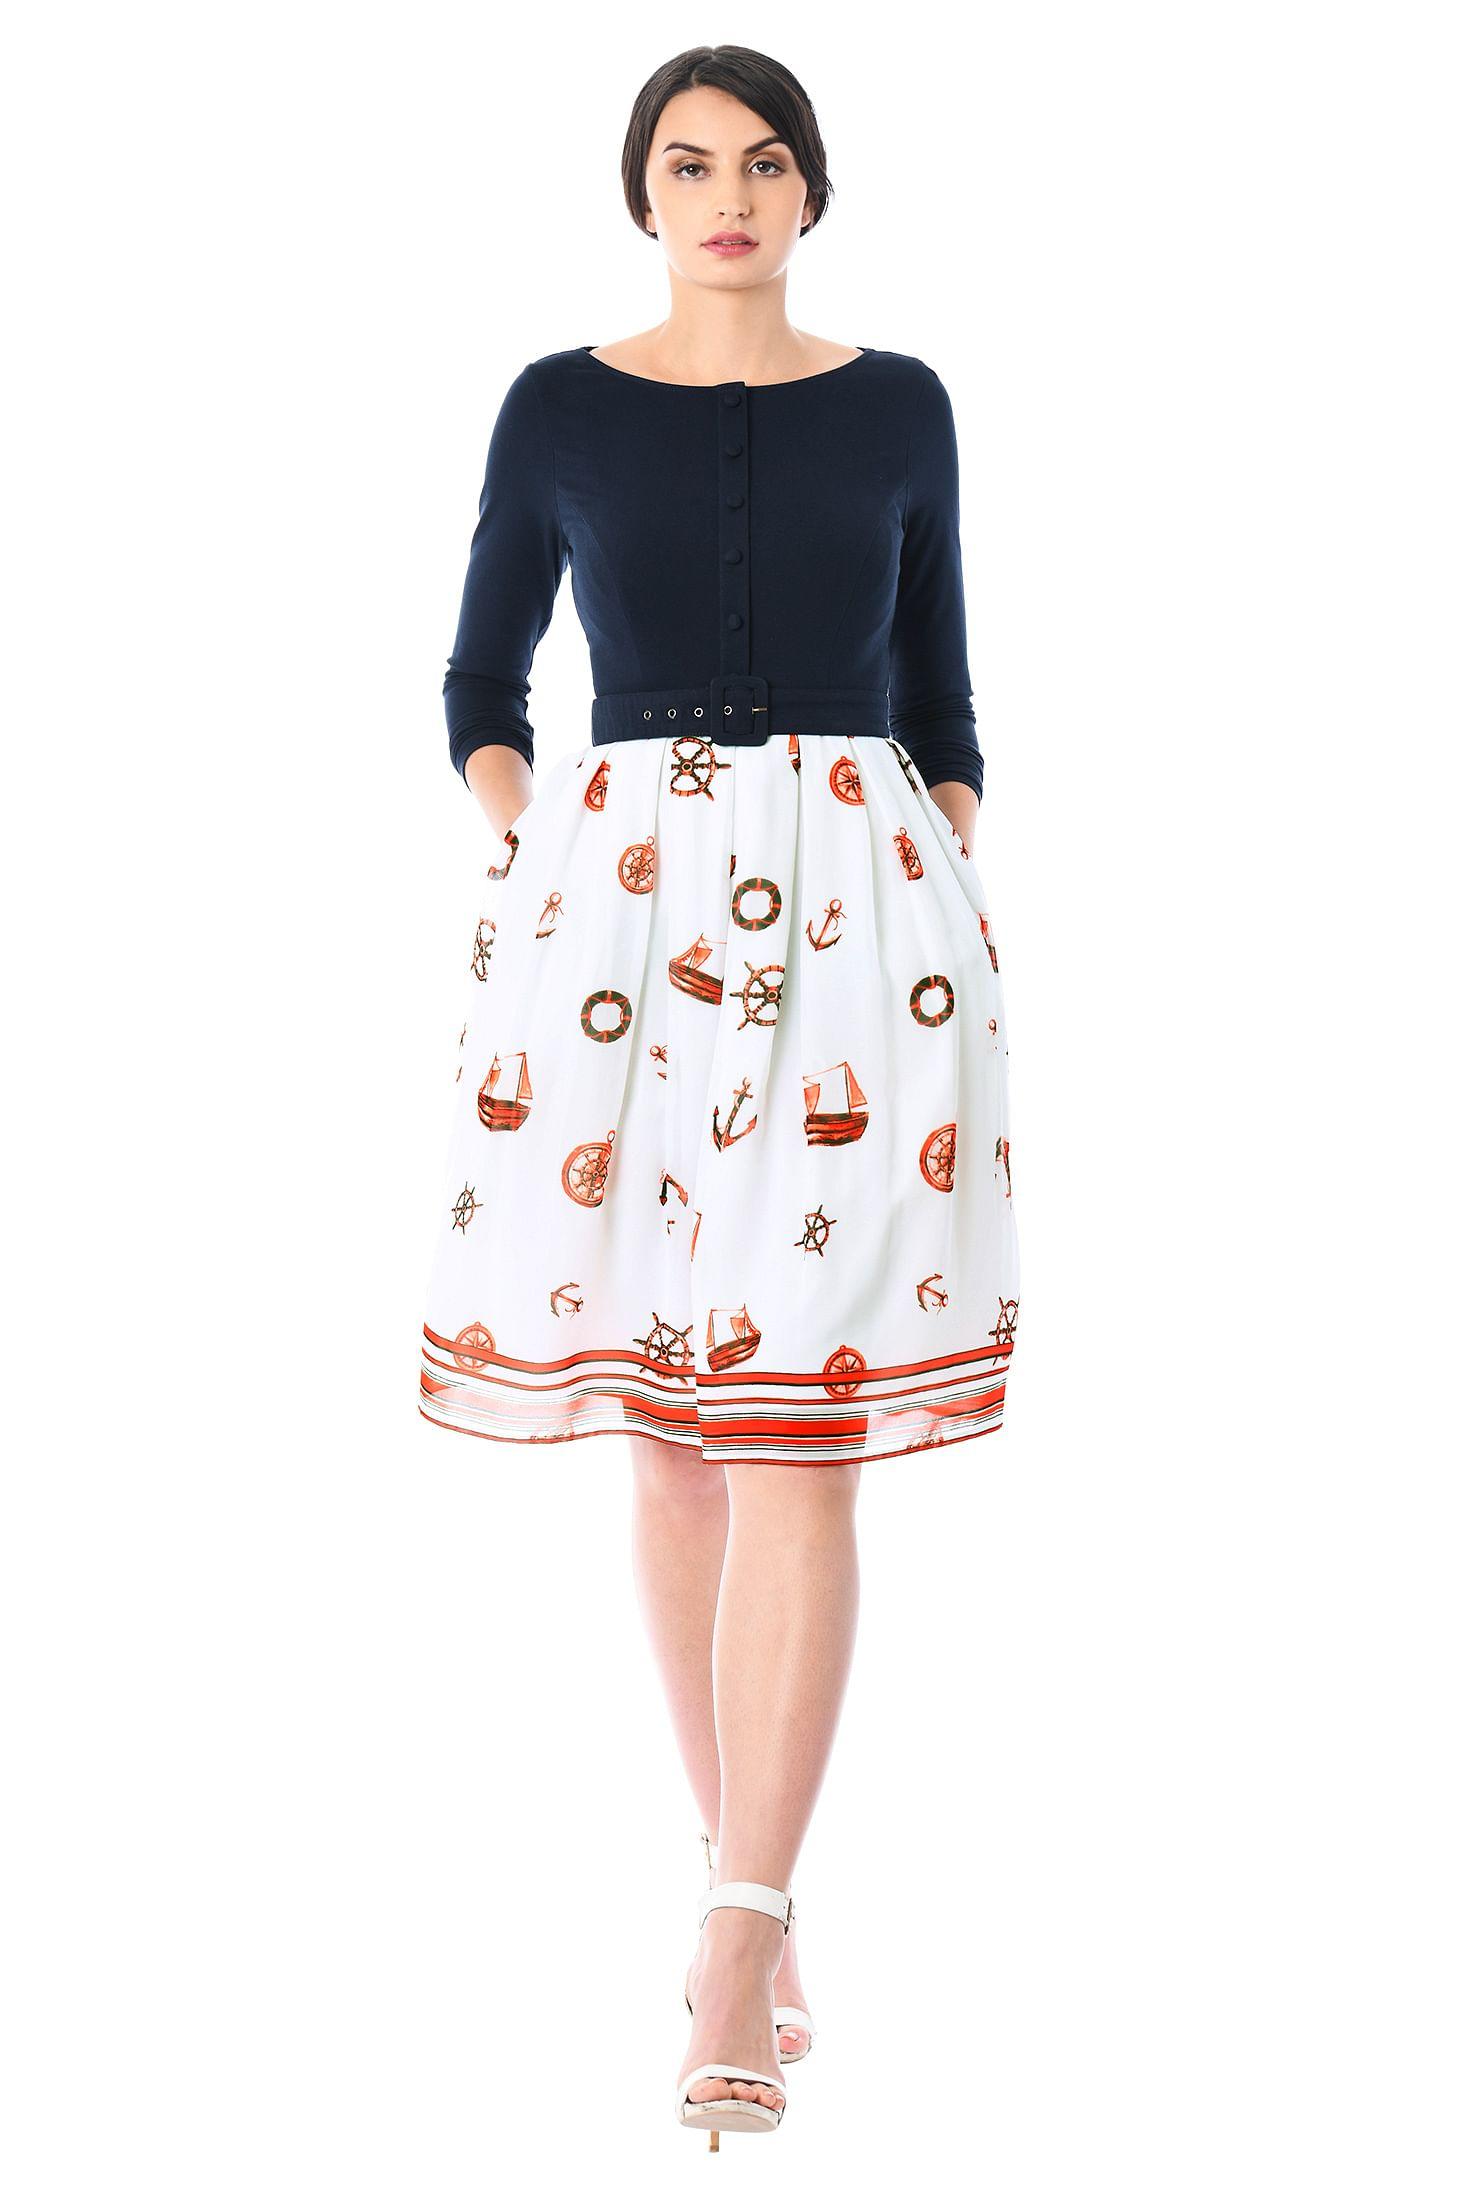 5deb7c33b37c boat neck dresses, box-pleated skirt dresses, Bracelet sleeve dresses,  Colorblock